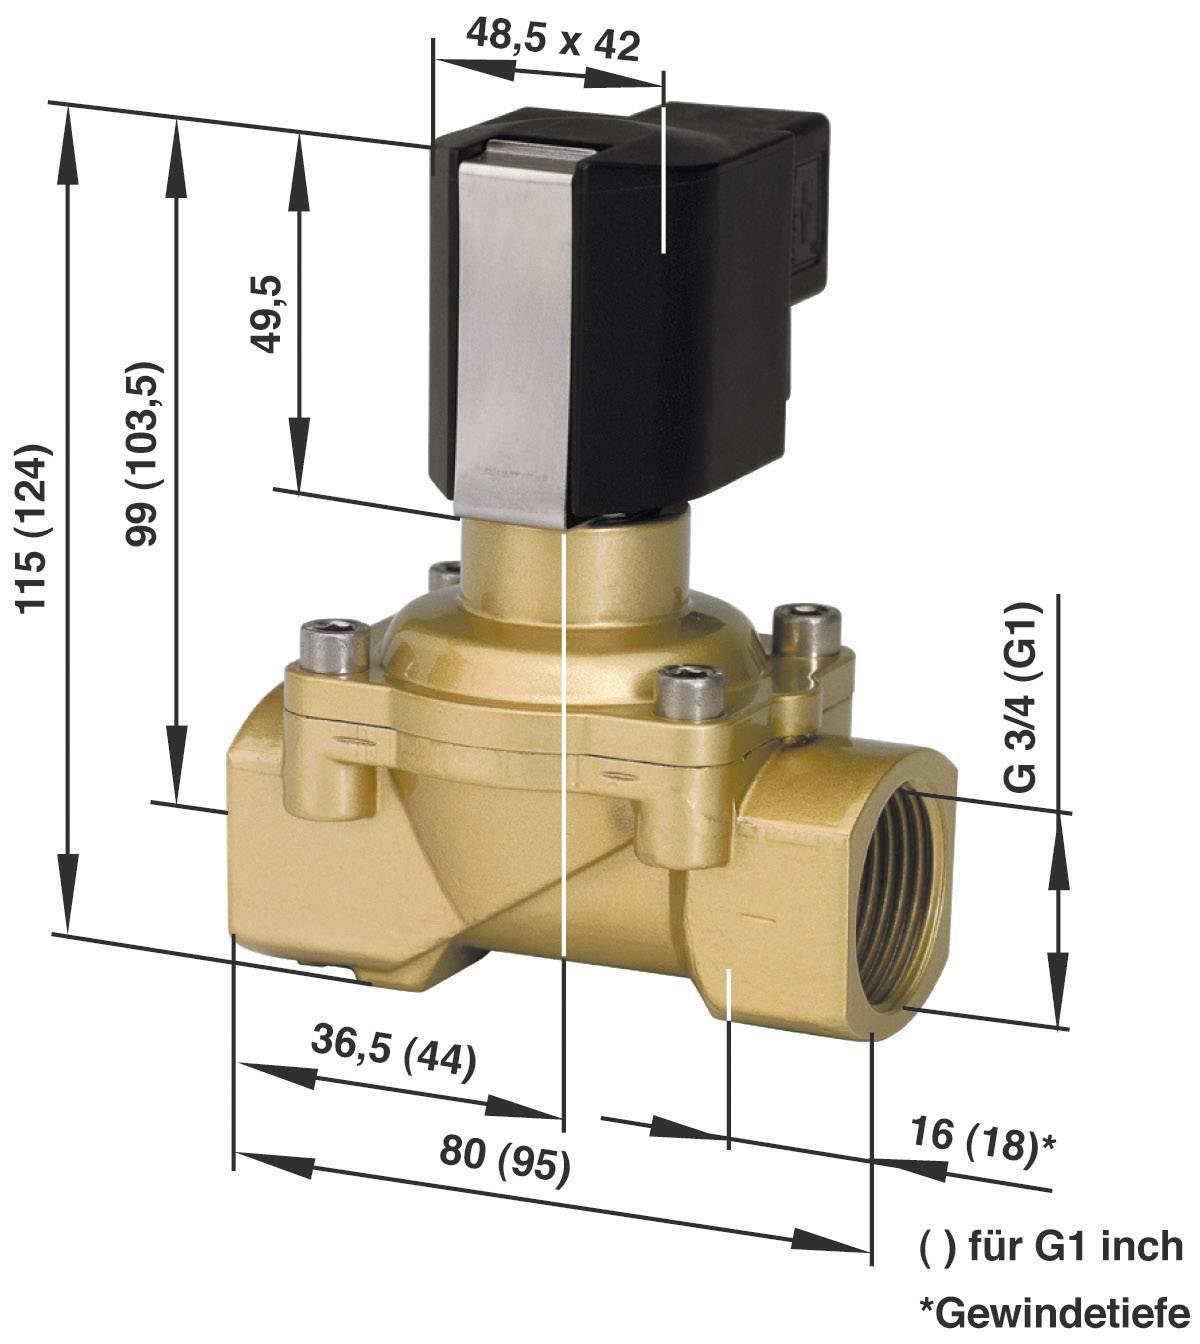 2/2-cestný elektromagnetický ventil Busch Jost 8254400.9154.23049, G 1, 230 V/AC